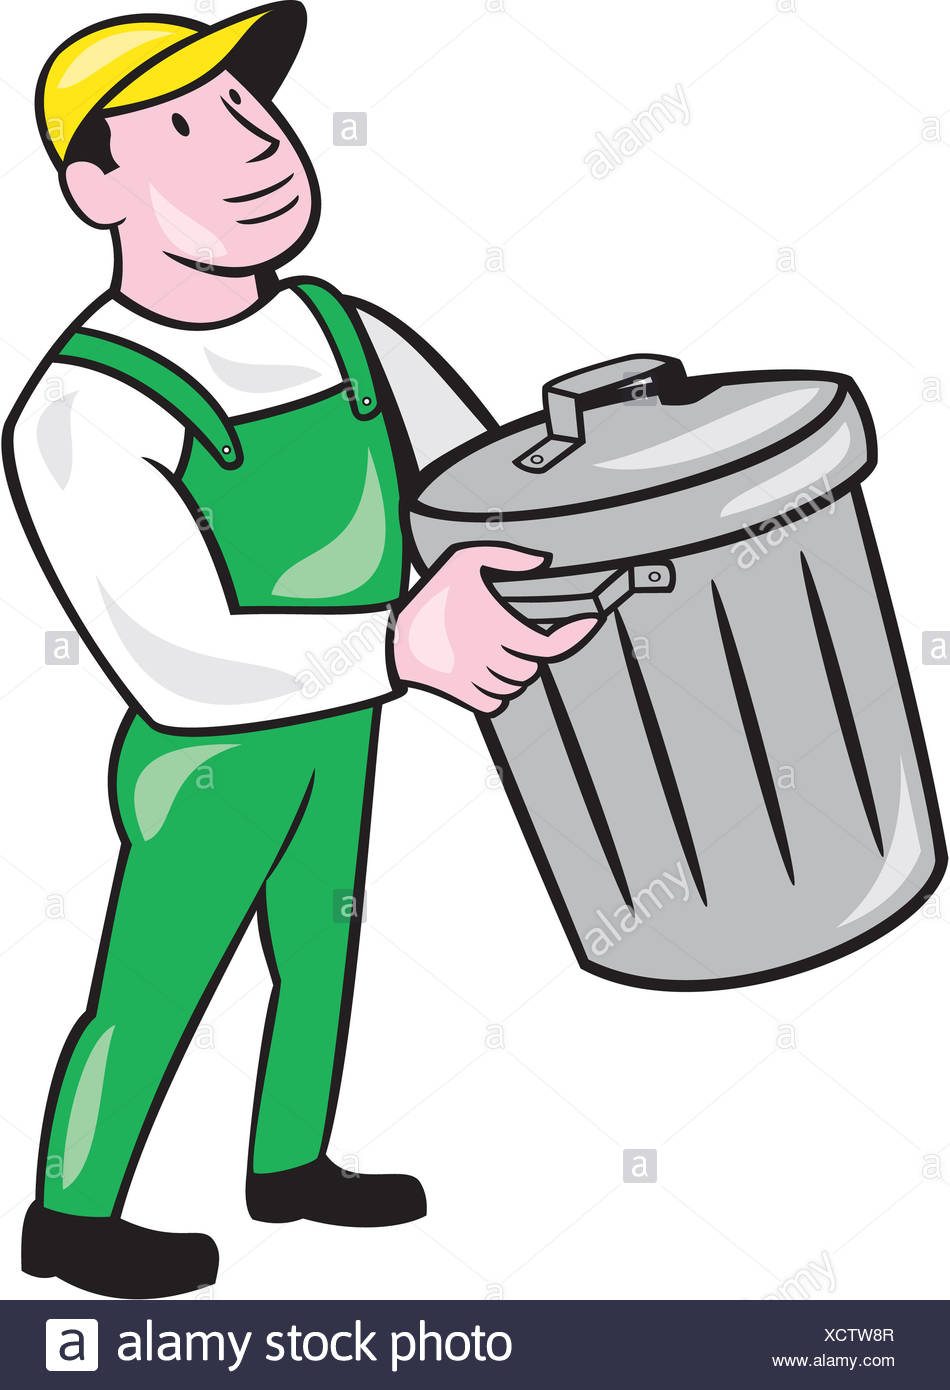 Garbage Man And Carrying Bin Stock Photos & Garbage Man ...  Garbage Man And...